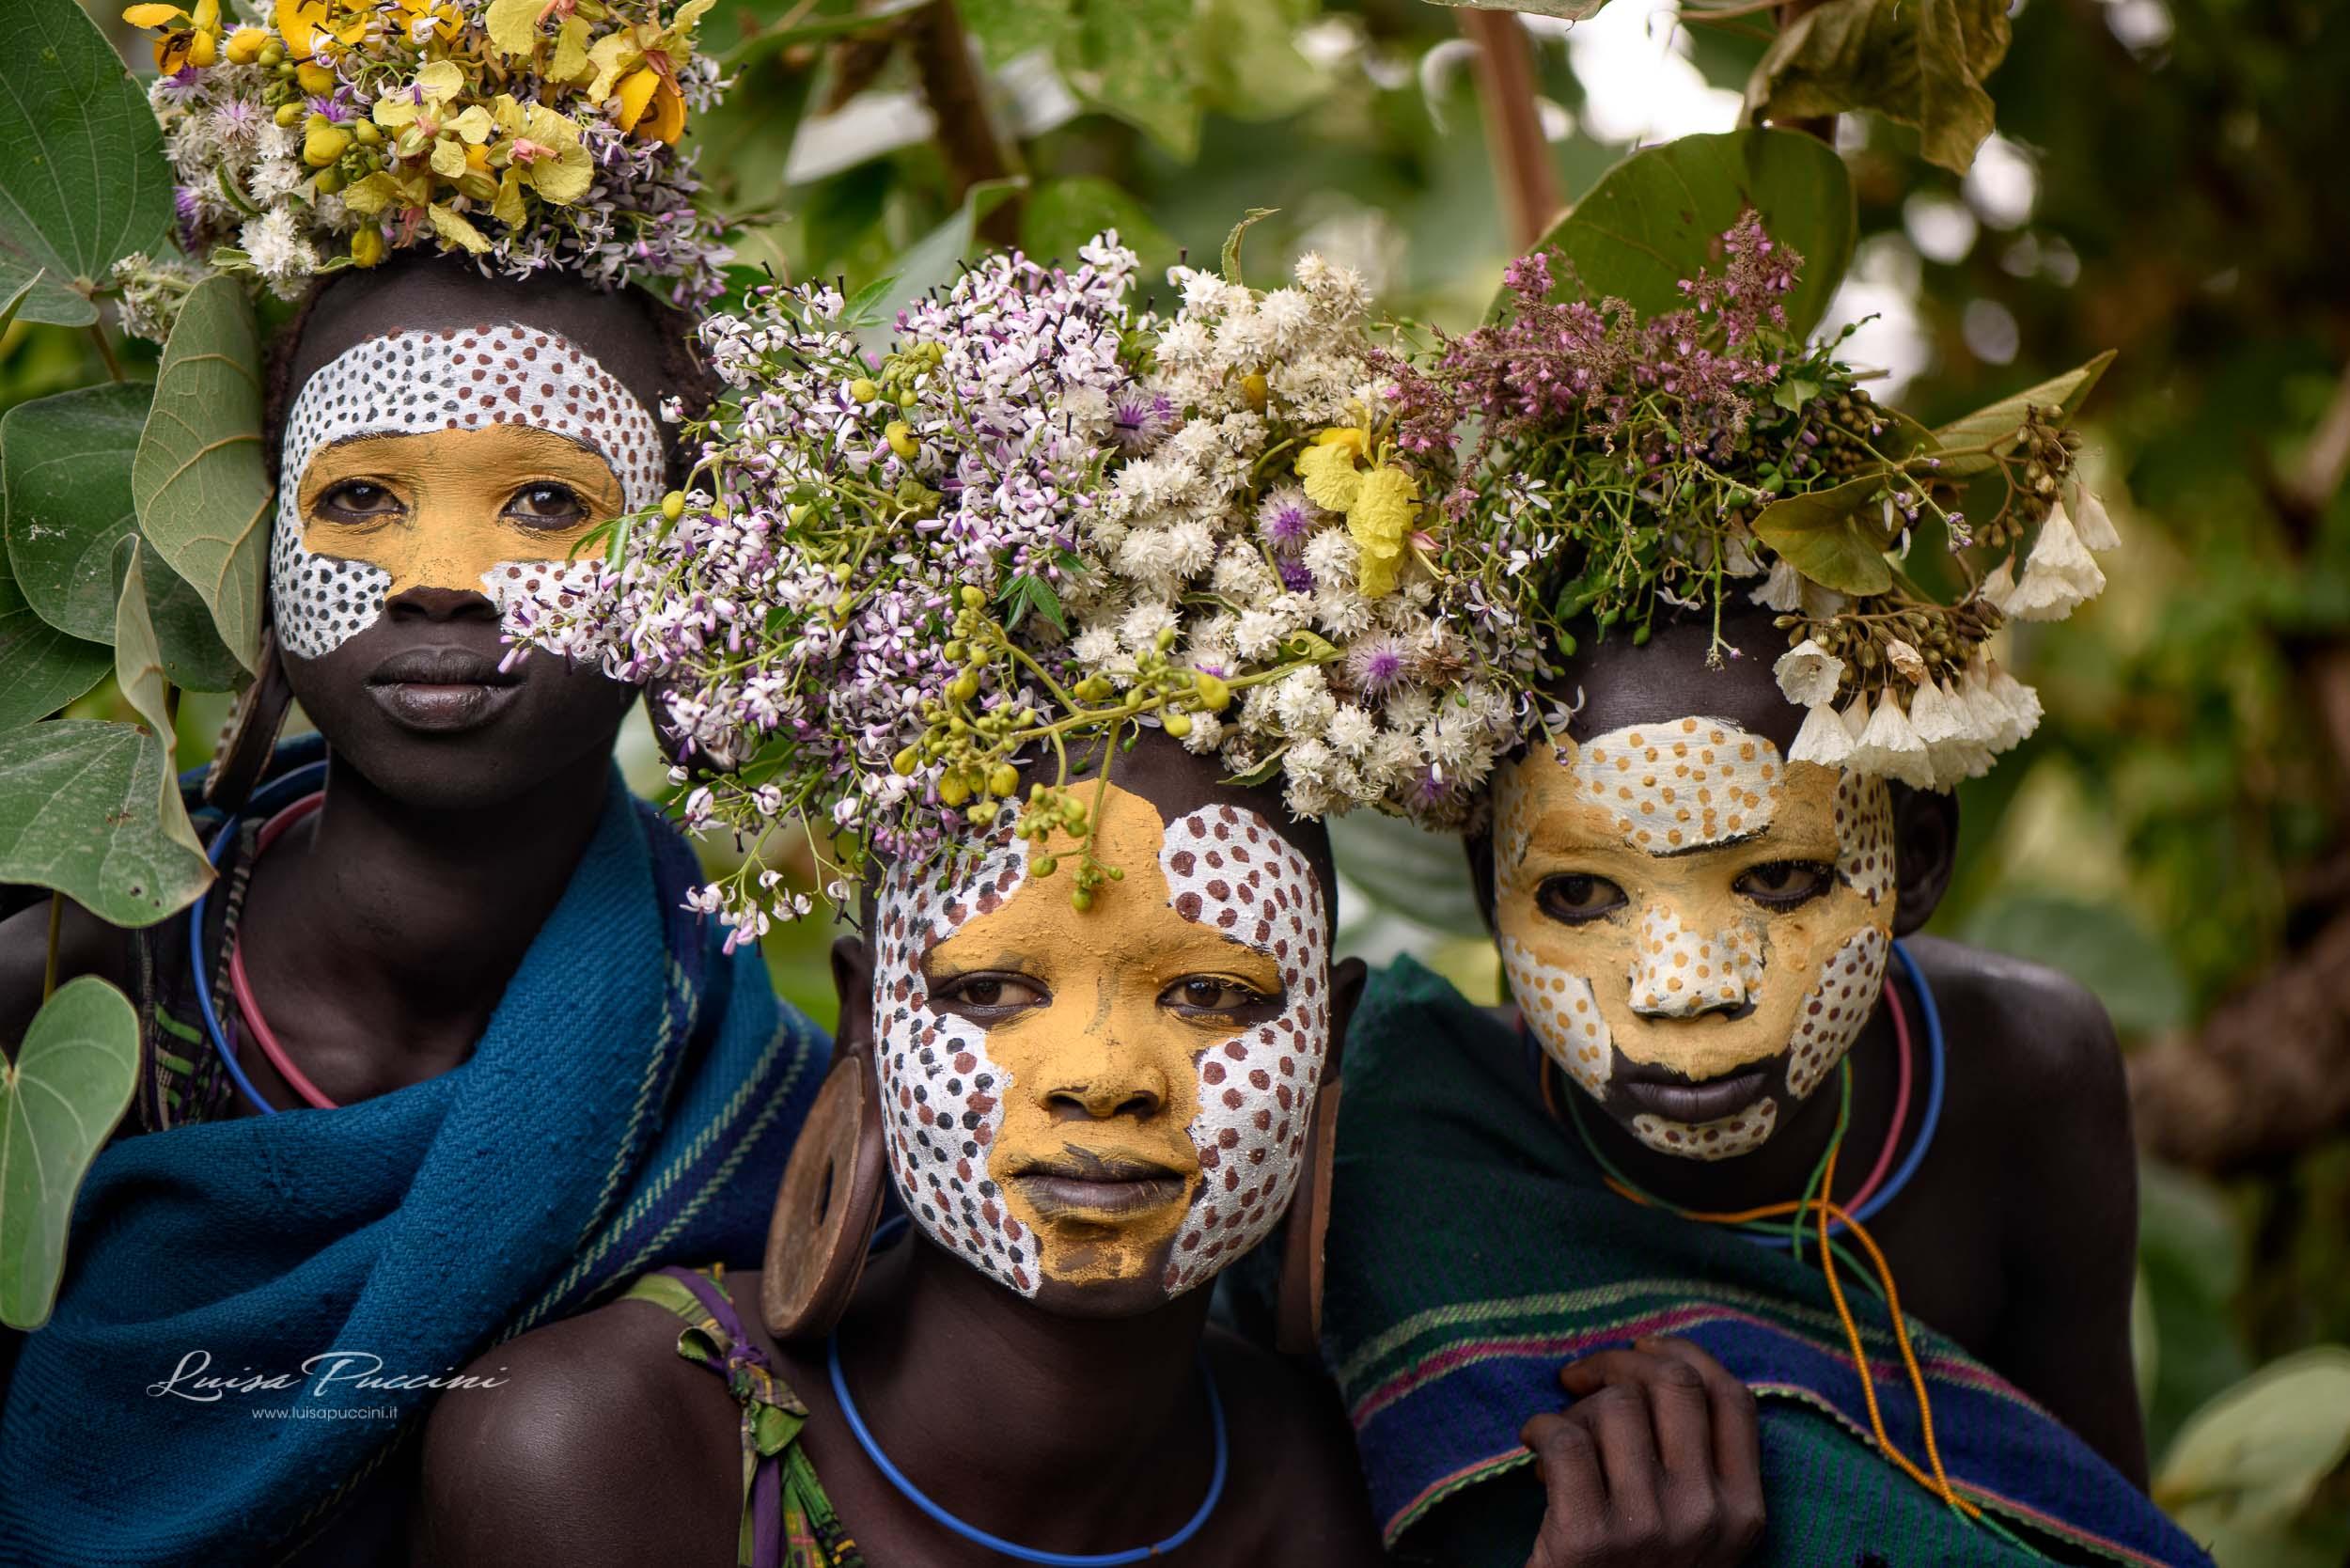 Surmi, portrait, ethiopia, Africa, tribe, bosy painting, flower, travel, luisa Puccini